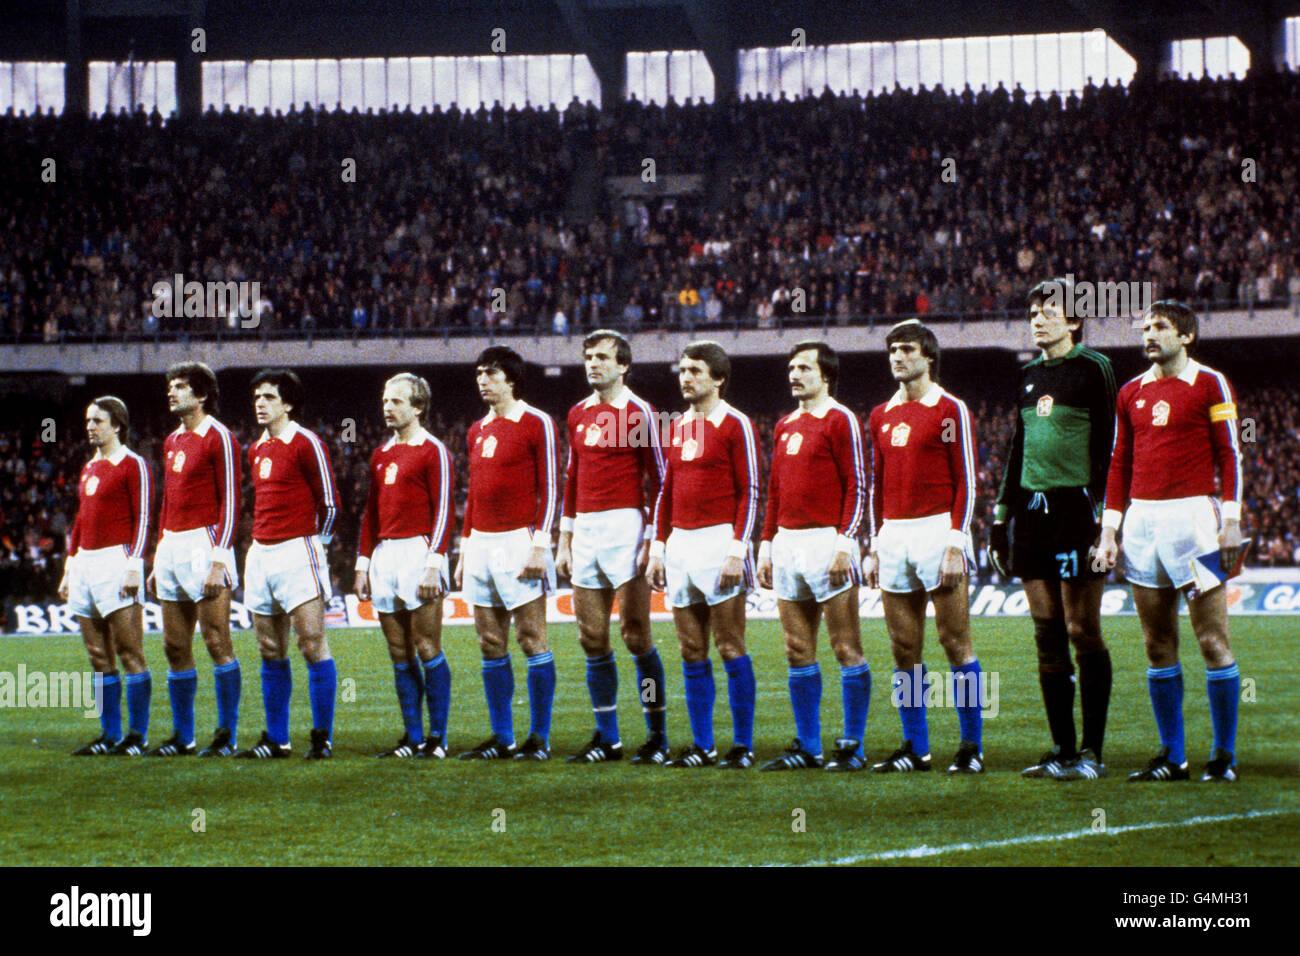 Soccer - Czechoslovakia - Stock Image